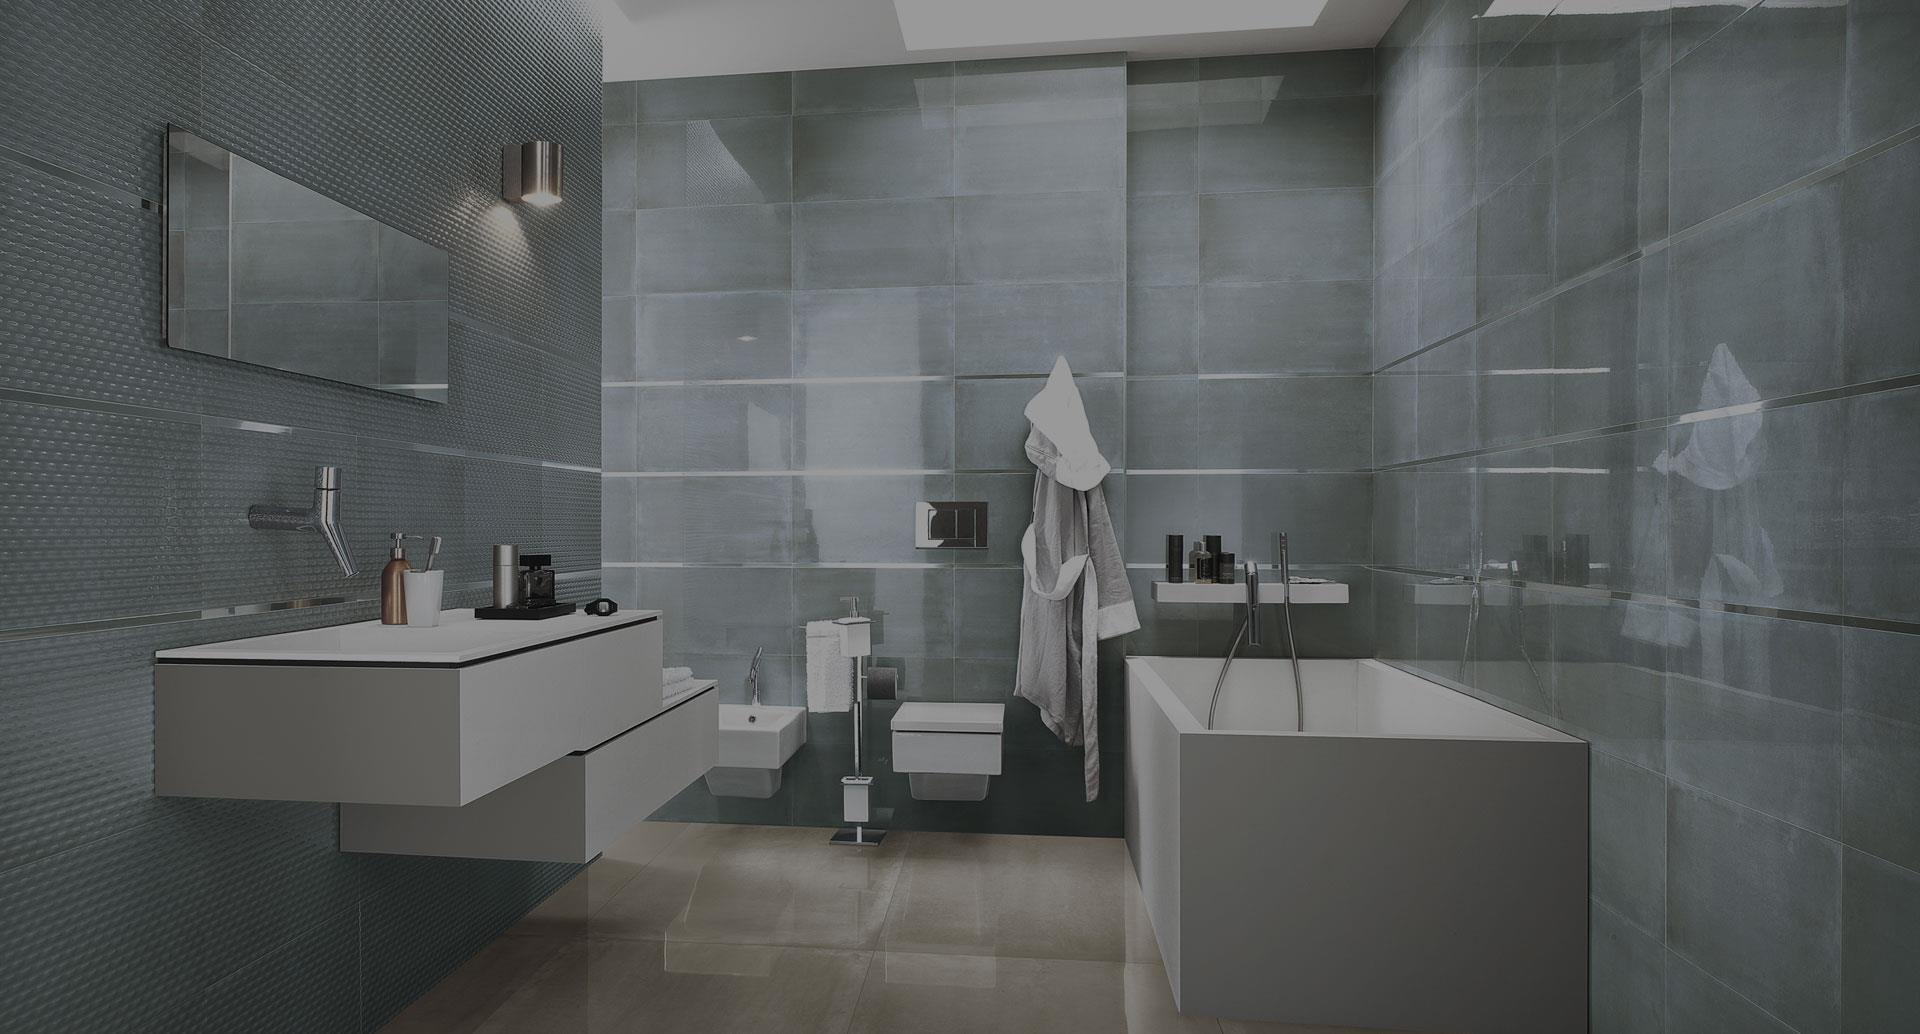 Moderní obklady a dlažby do interiéru i exteriéru